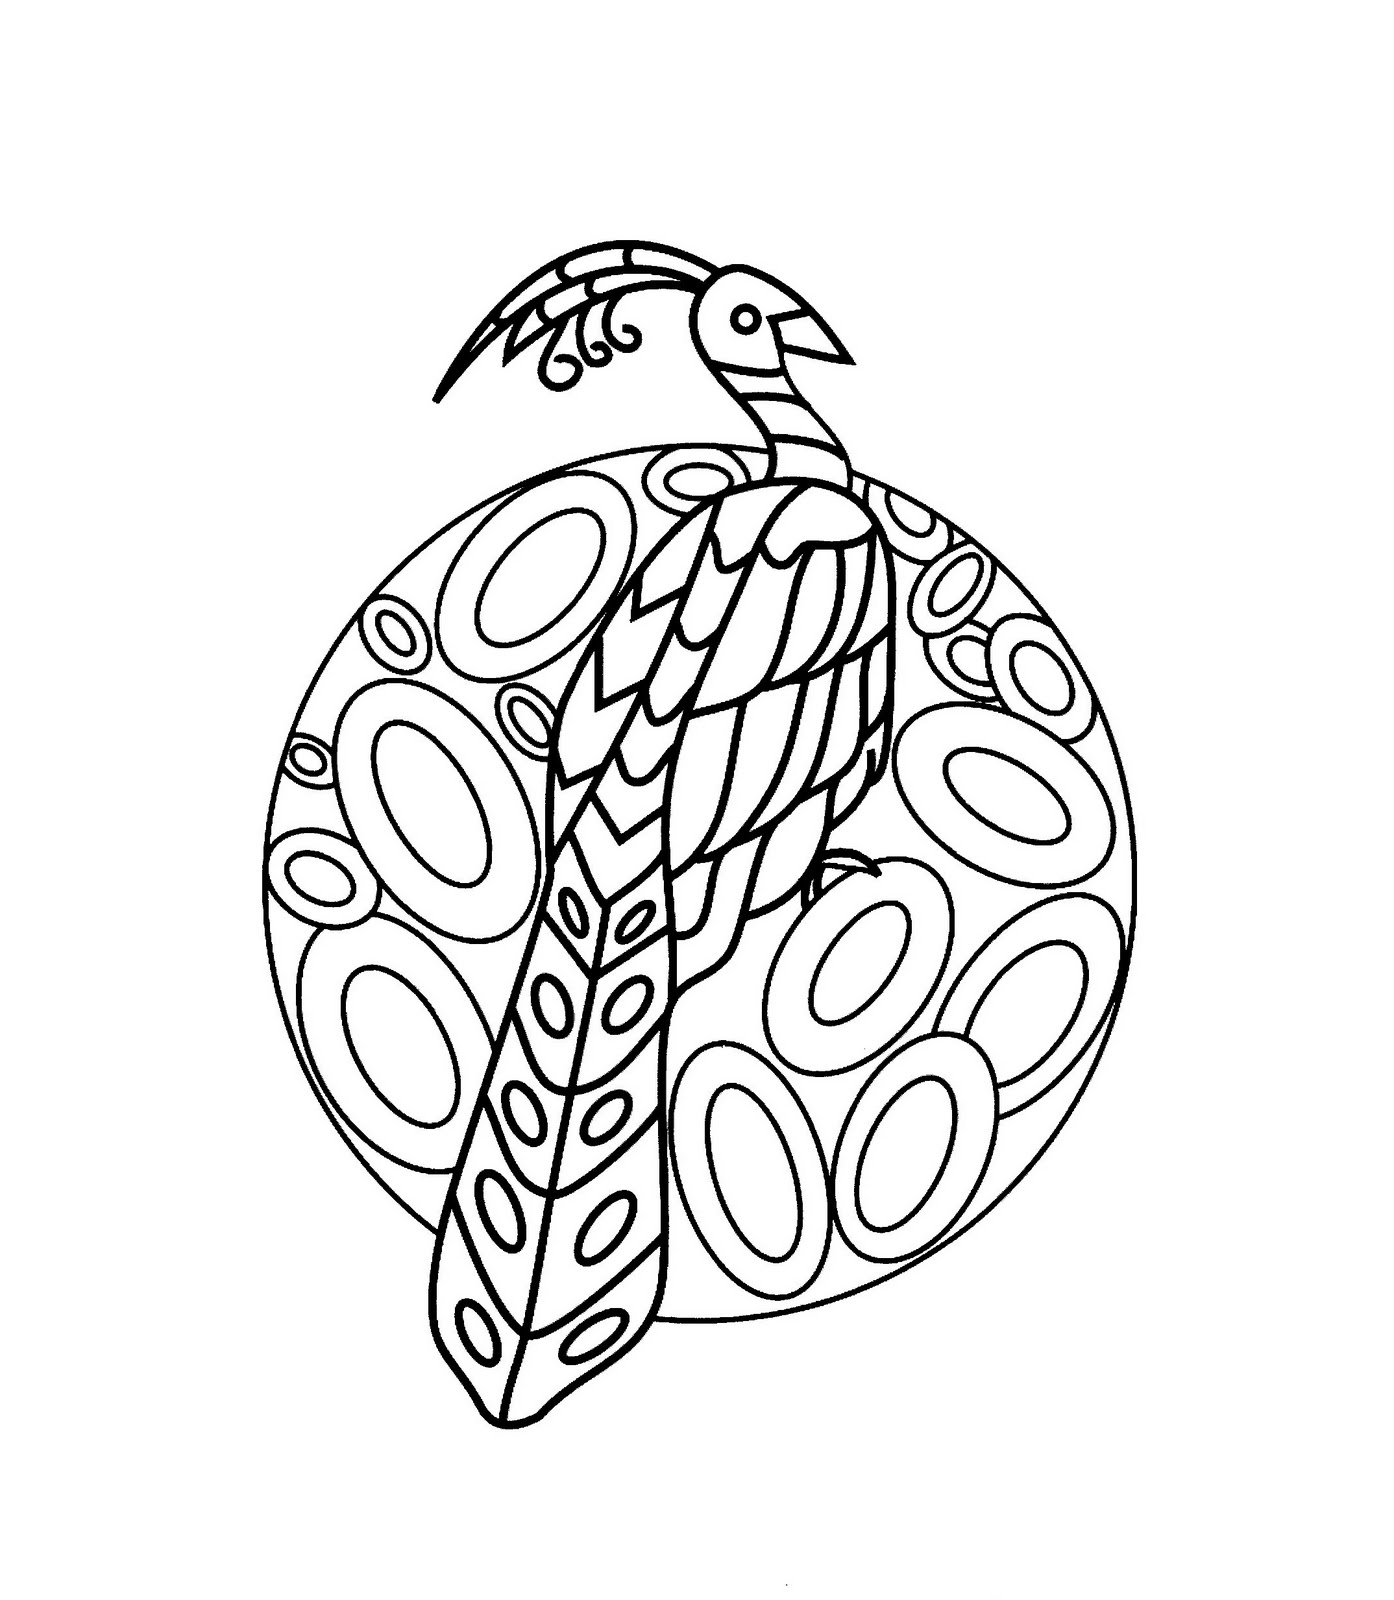 Mandalas Para Pintar: Mandala con pavo real